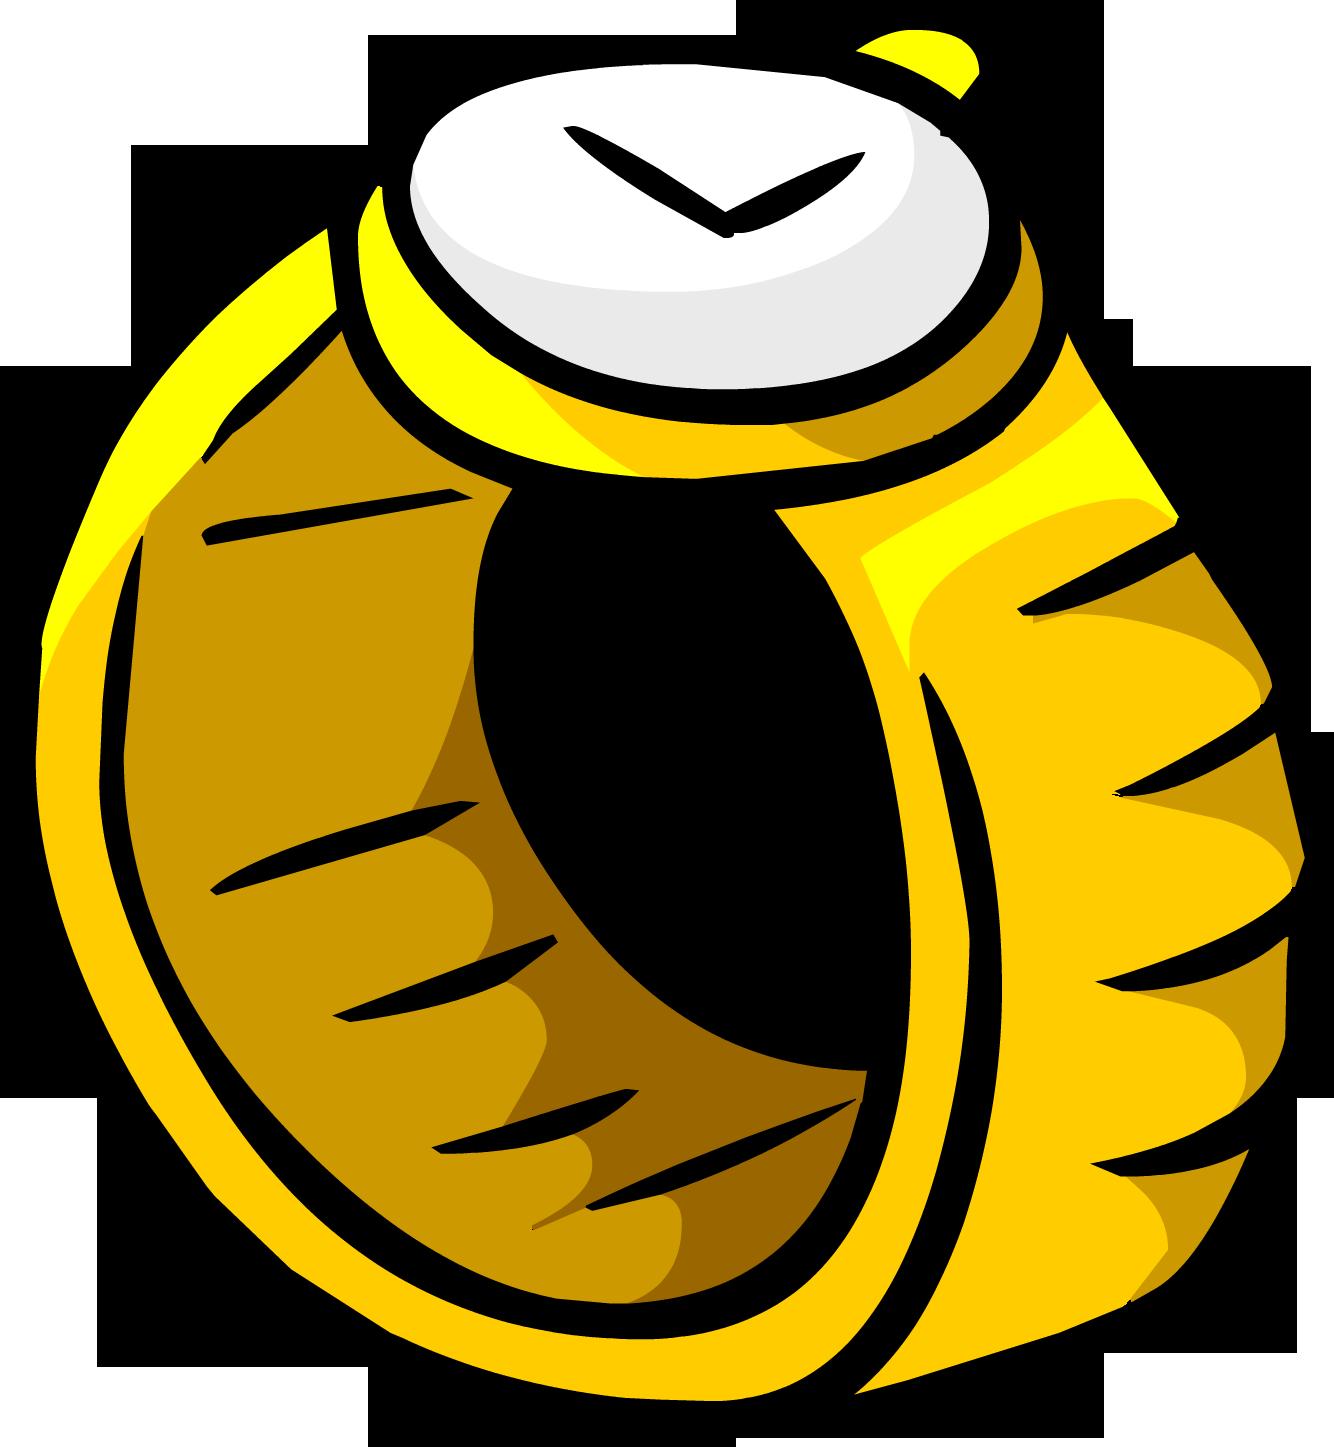 Club clipart gold club. Wristwatch penguin rewritten wiki